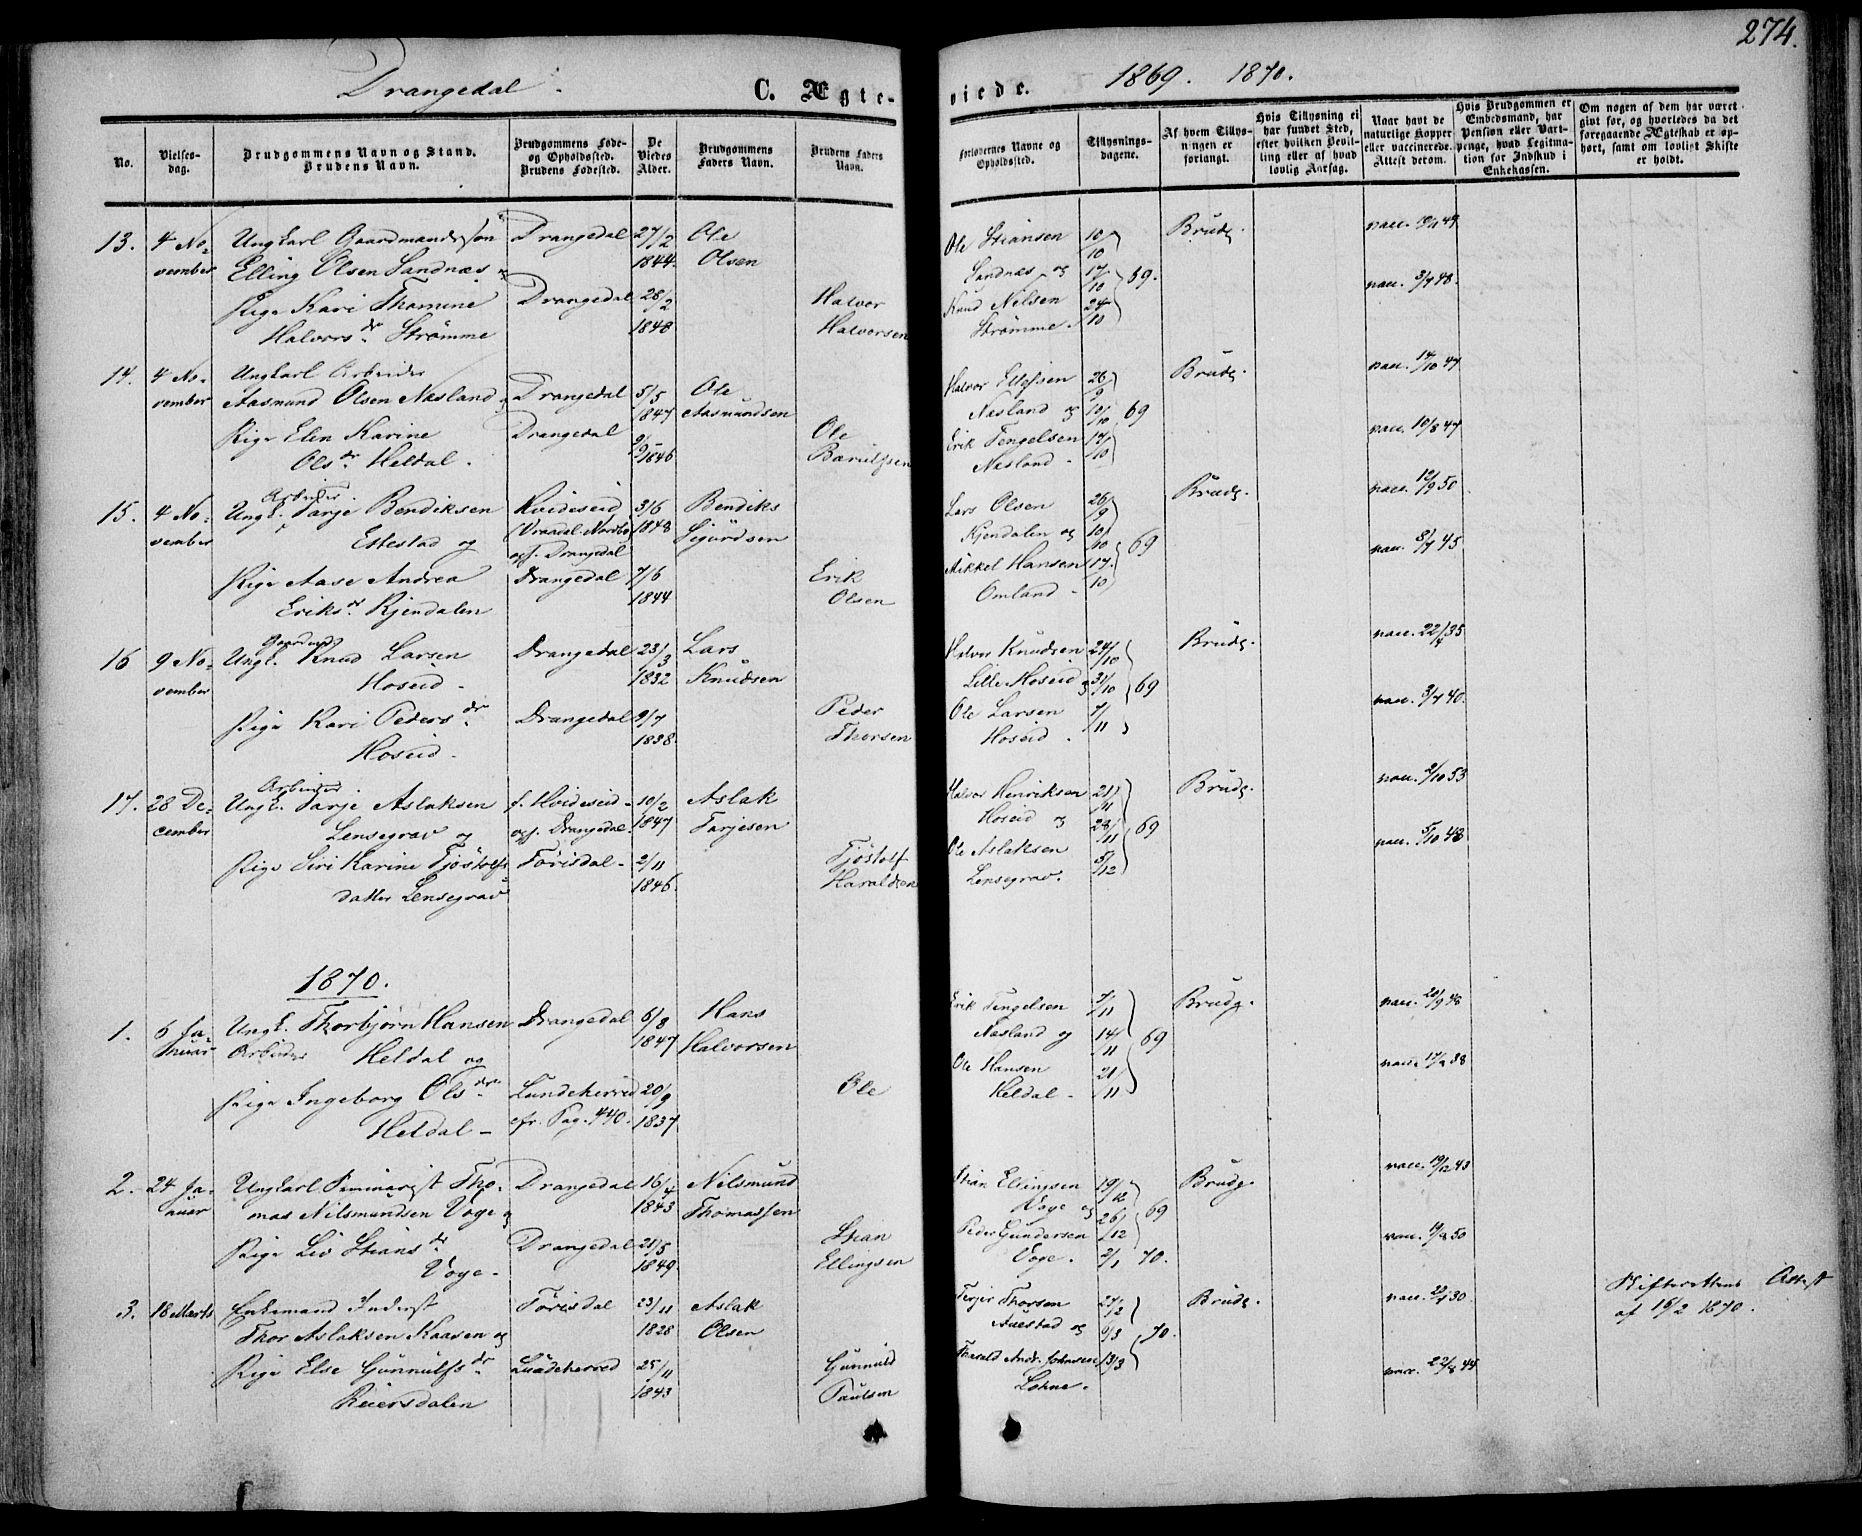 SAKO, Drangedal kirkebøker, F/Fa/L0008: Ministerialbok nr. 8, 1857-1871, s. 274